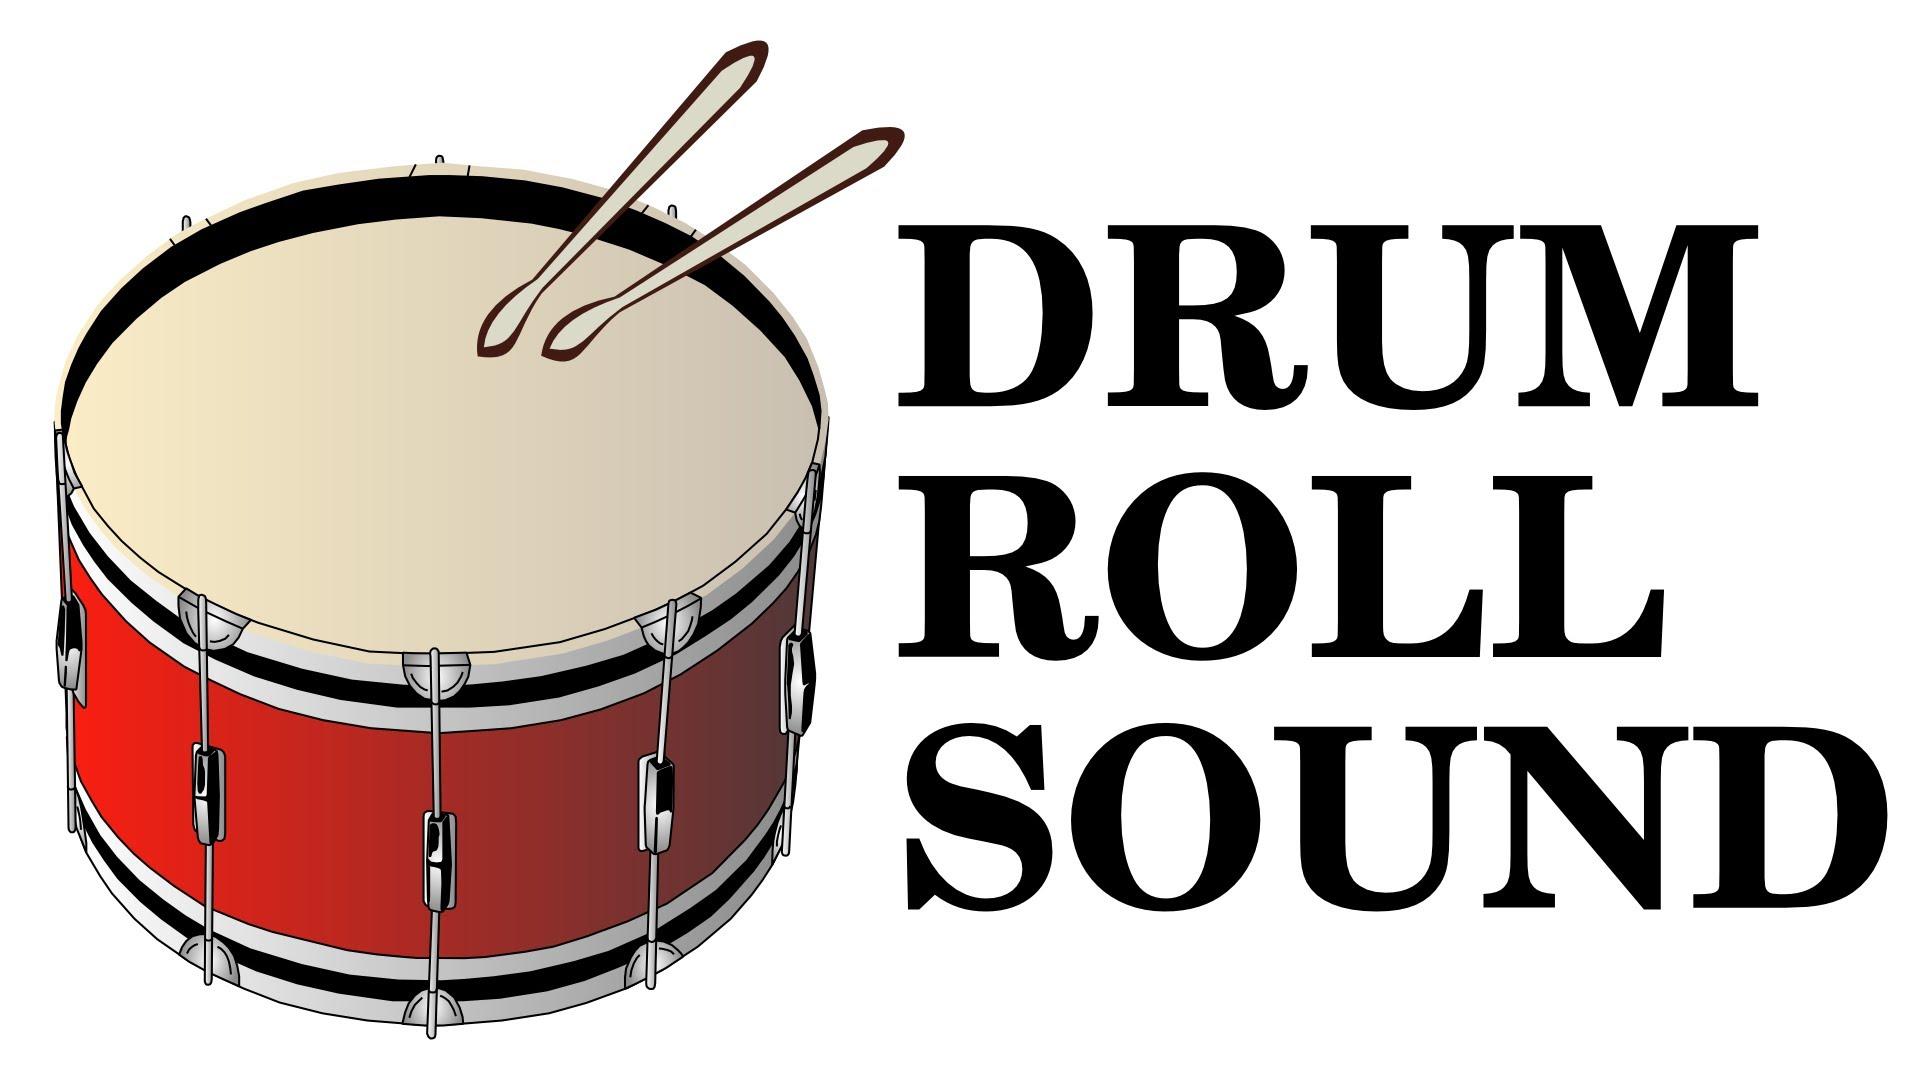 Drum Roll Sound Effect [High Quality, Fr-Drum Roll Sound Effect [High Quality, Free Download]-13